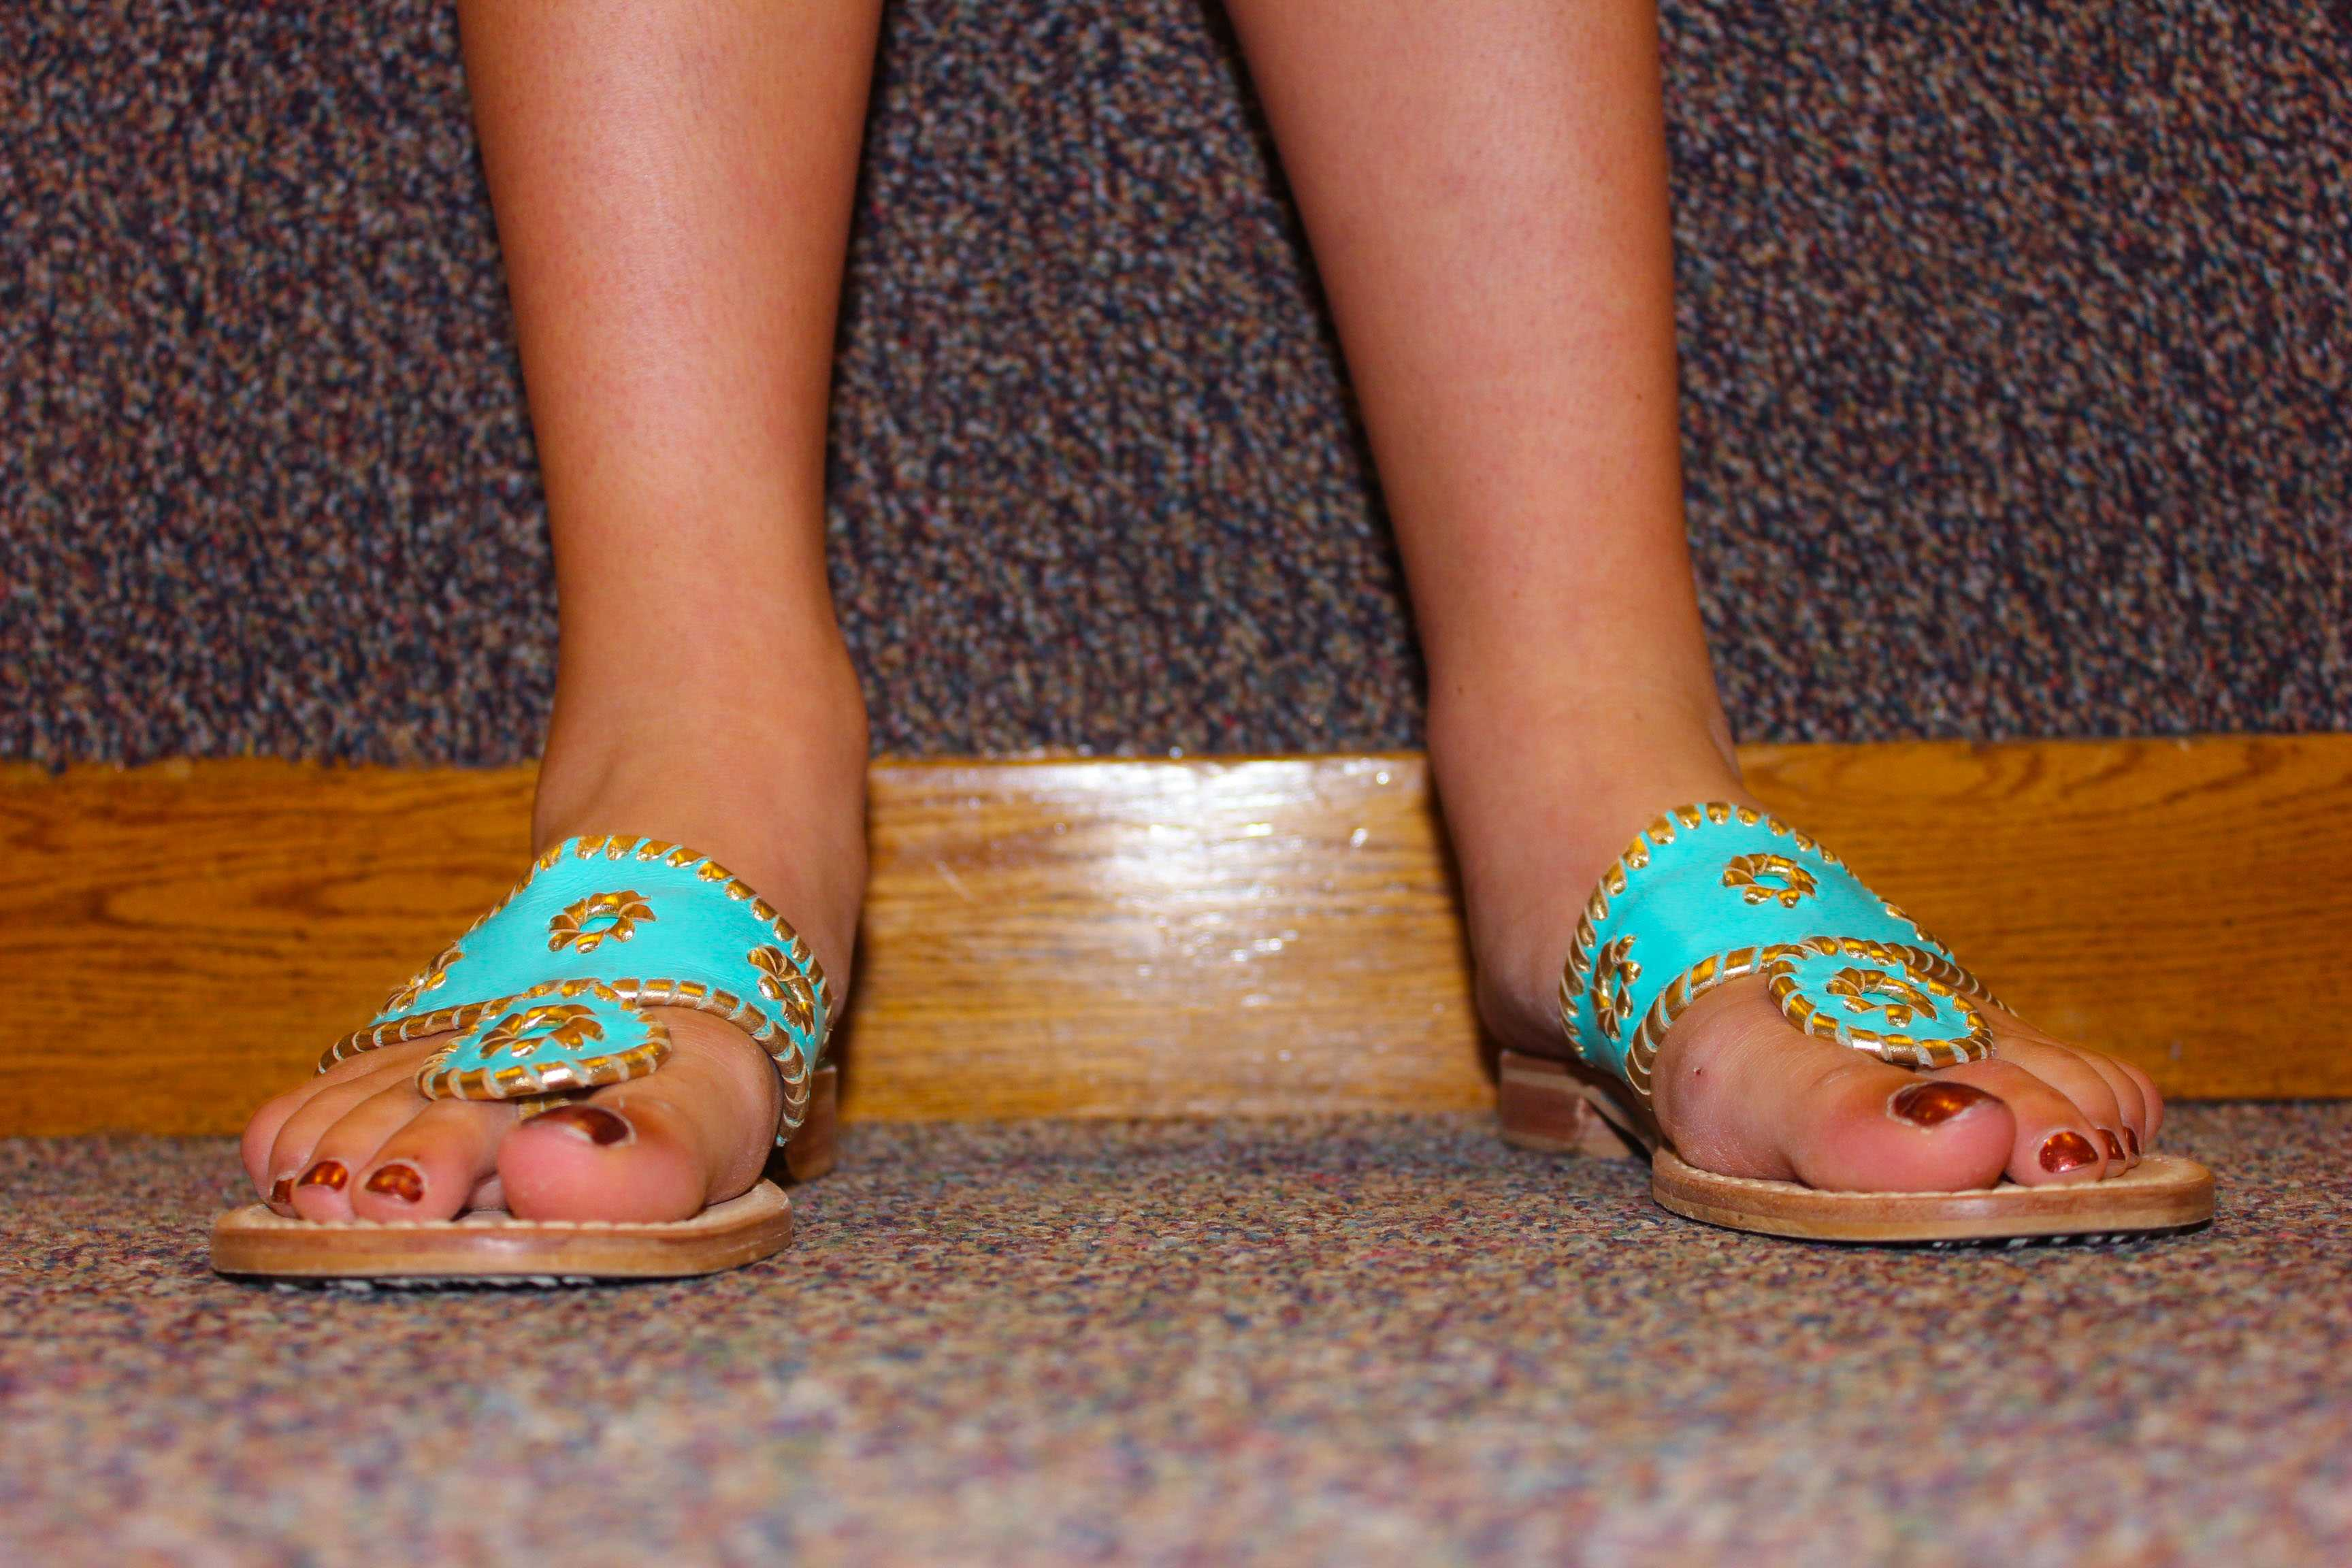 Senior Kathryn Schmechel's bright shoes warrant a close up.